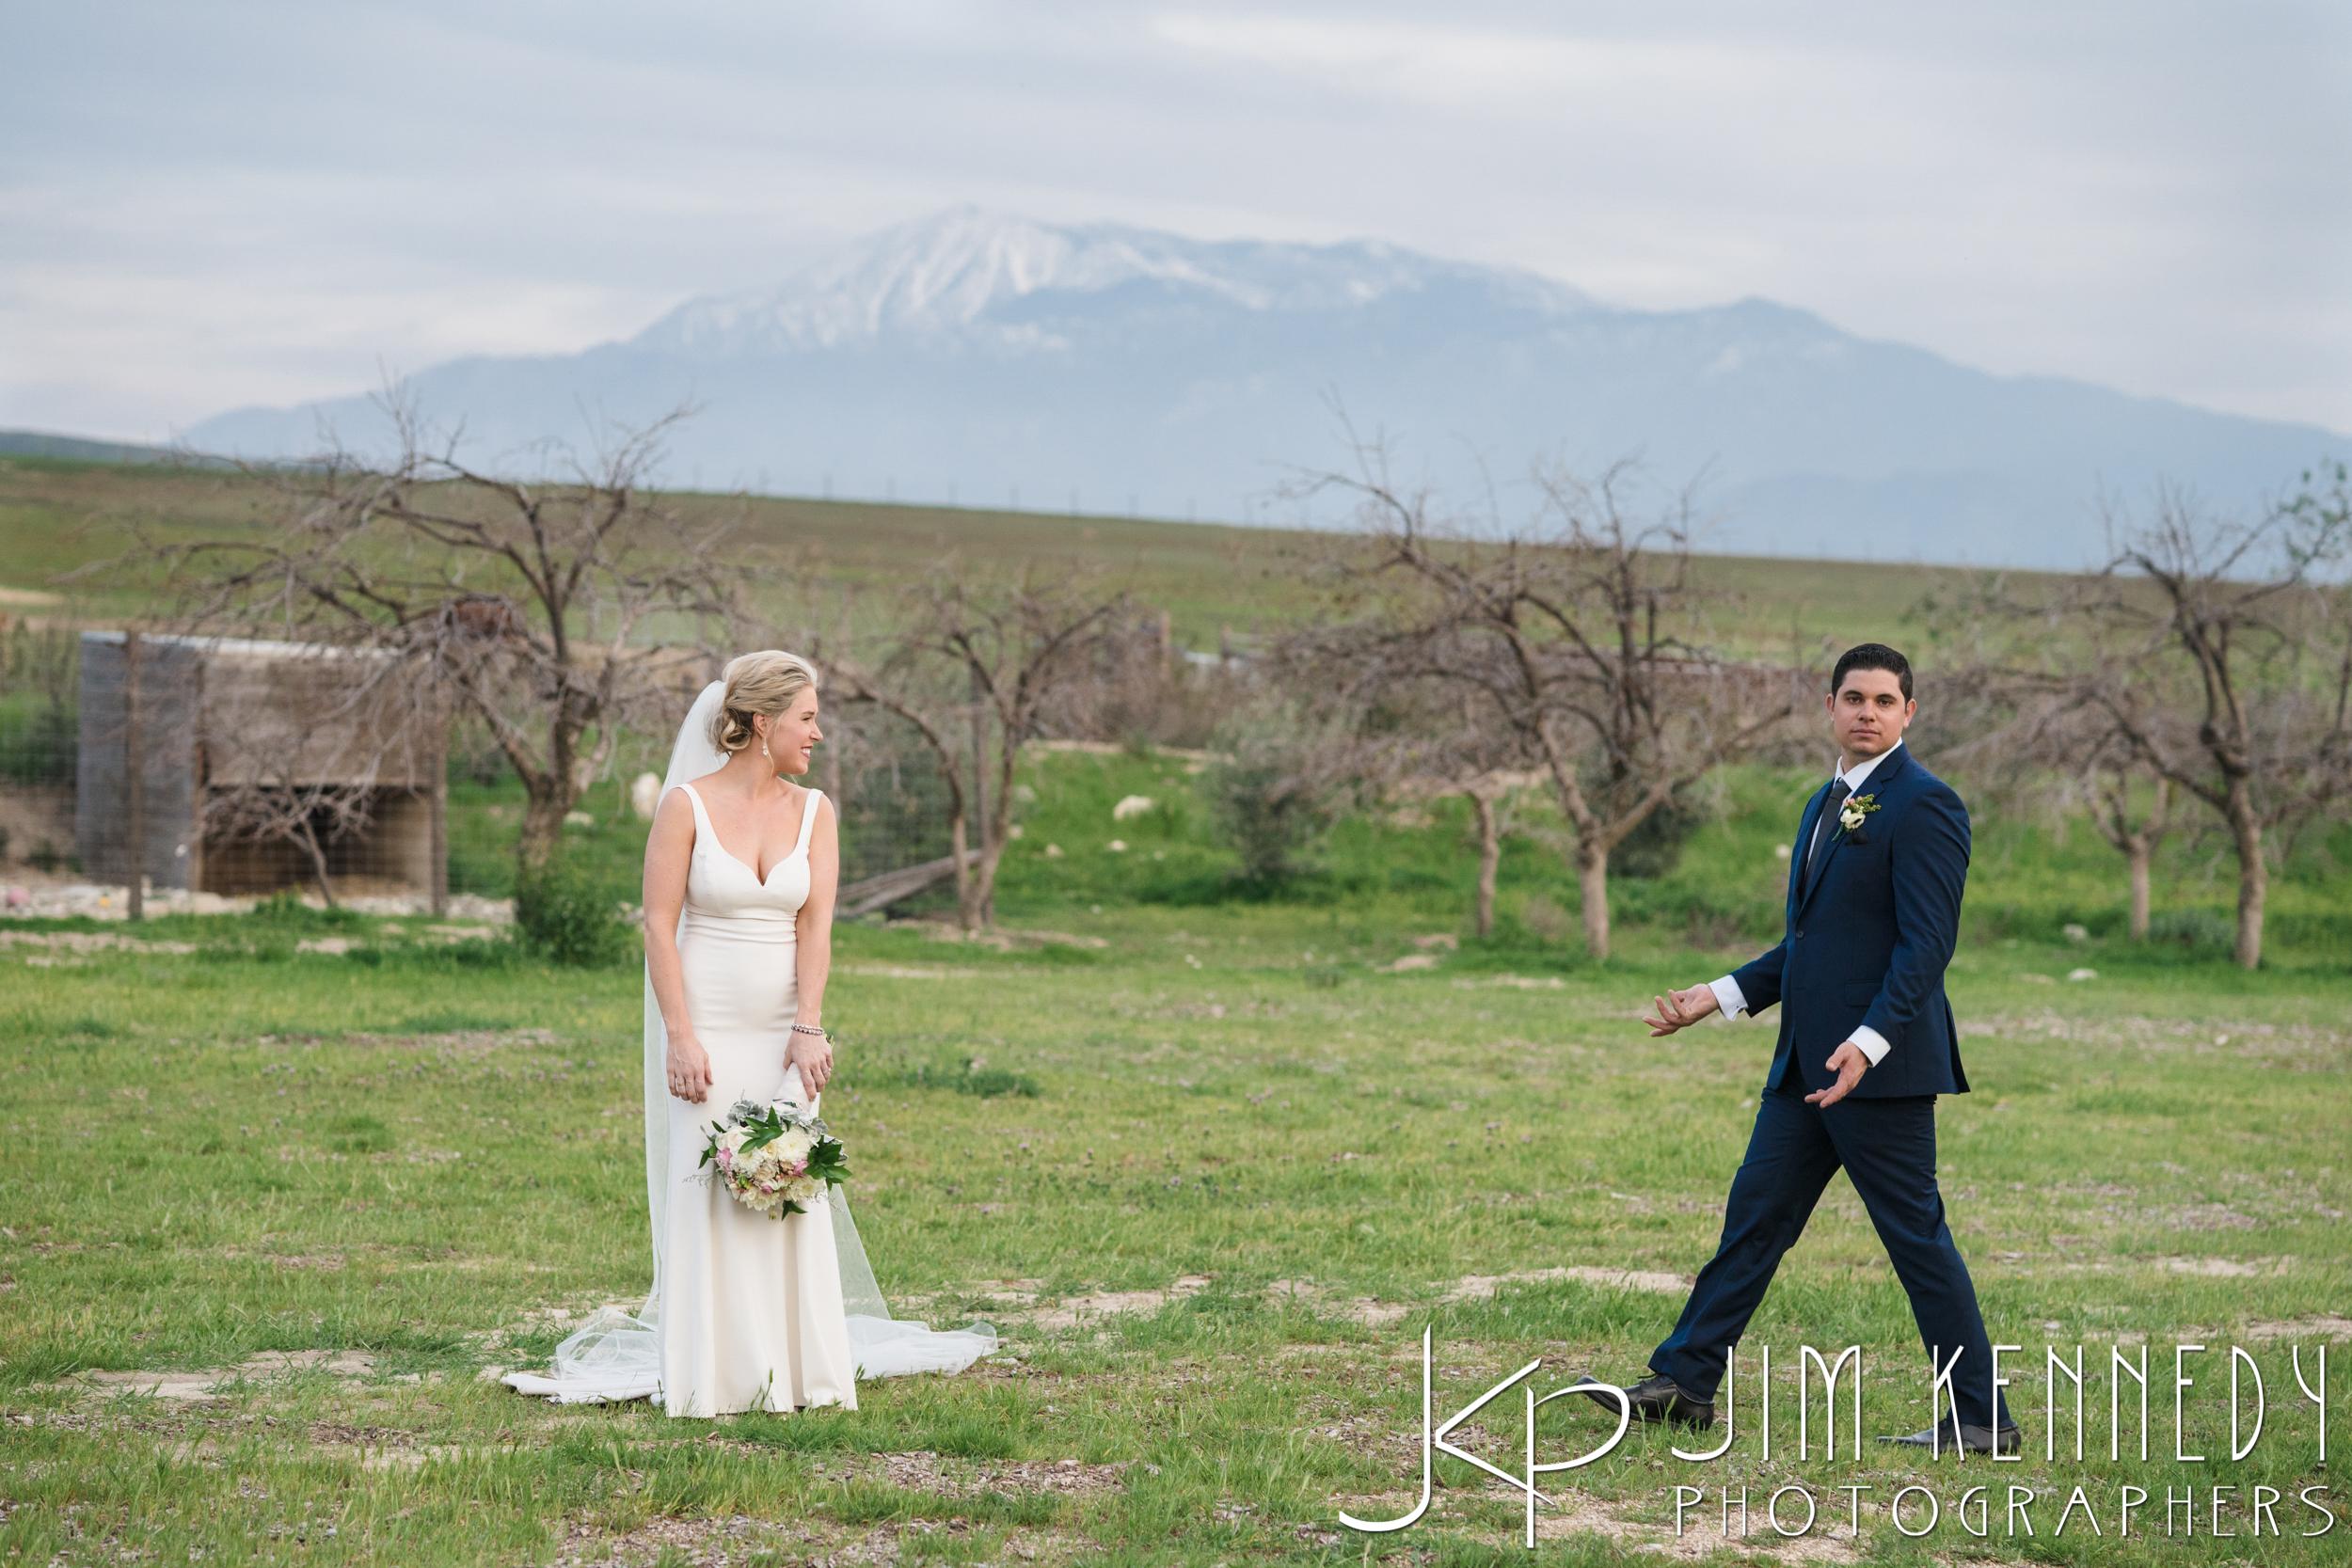 jim_kennedy_photographers_highland_springs_wedding_caitlyn_0139.jpg